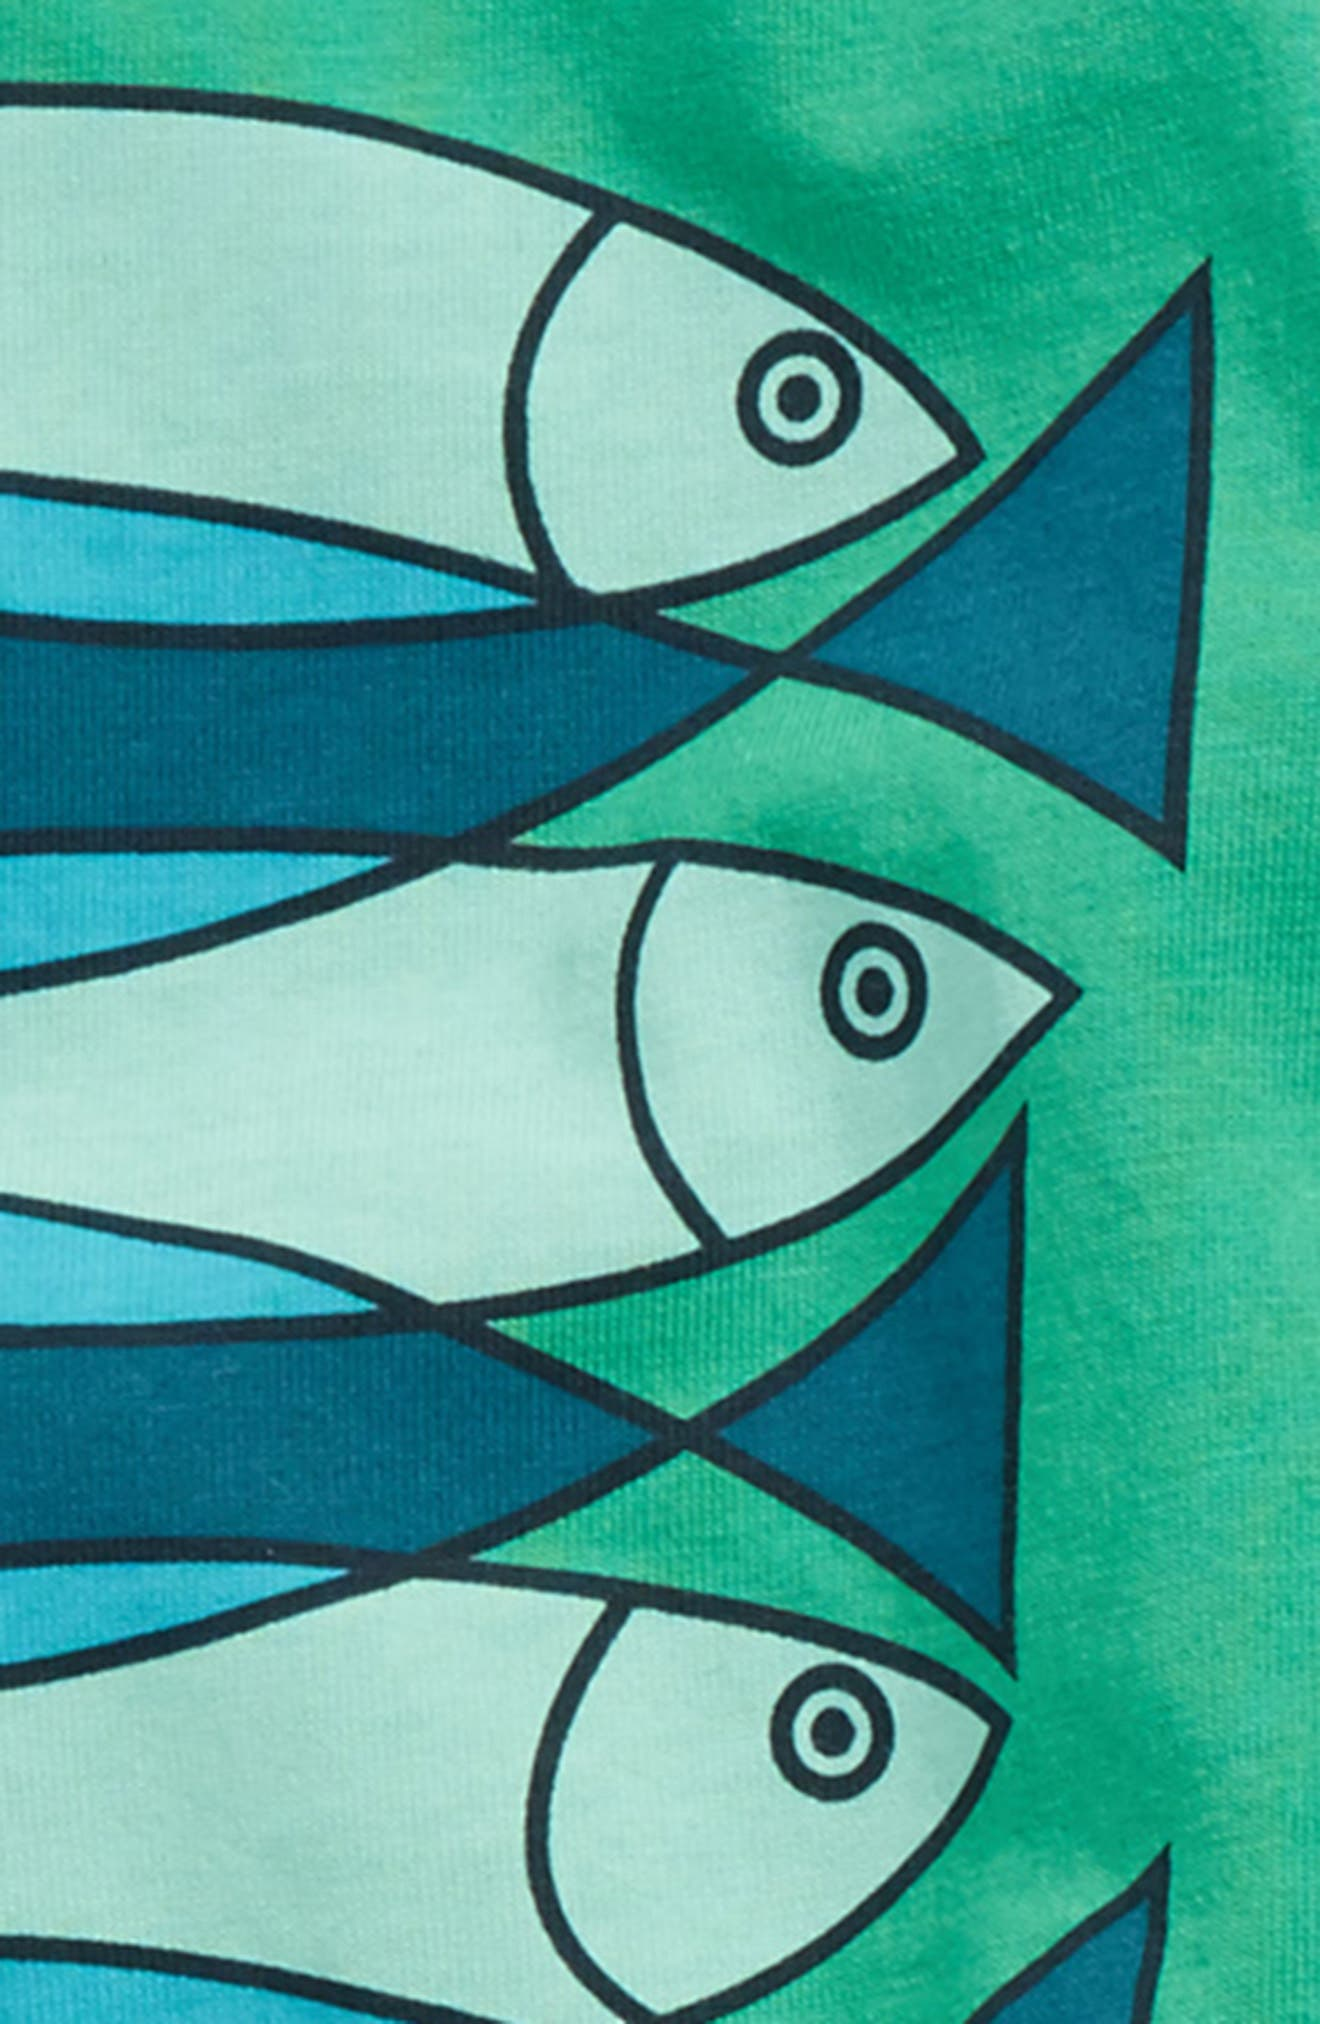 Fish School T-Shirt & Shorts Set,                             Alternate thumbnail 2, color,                             315